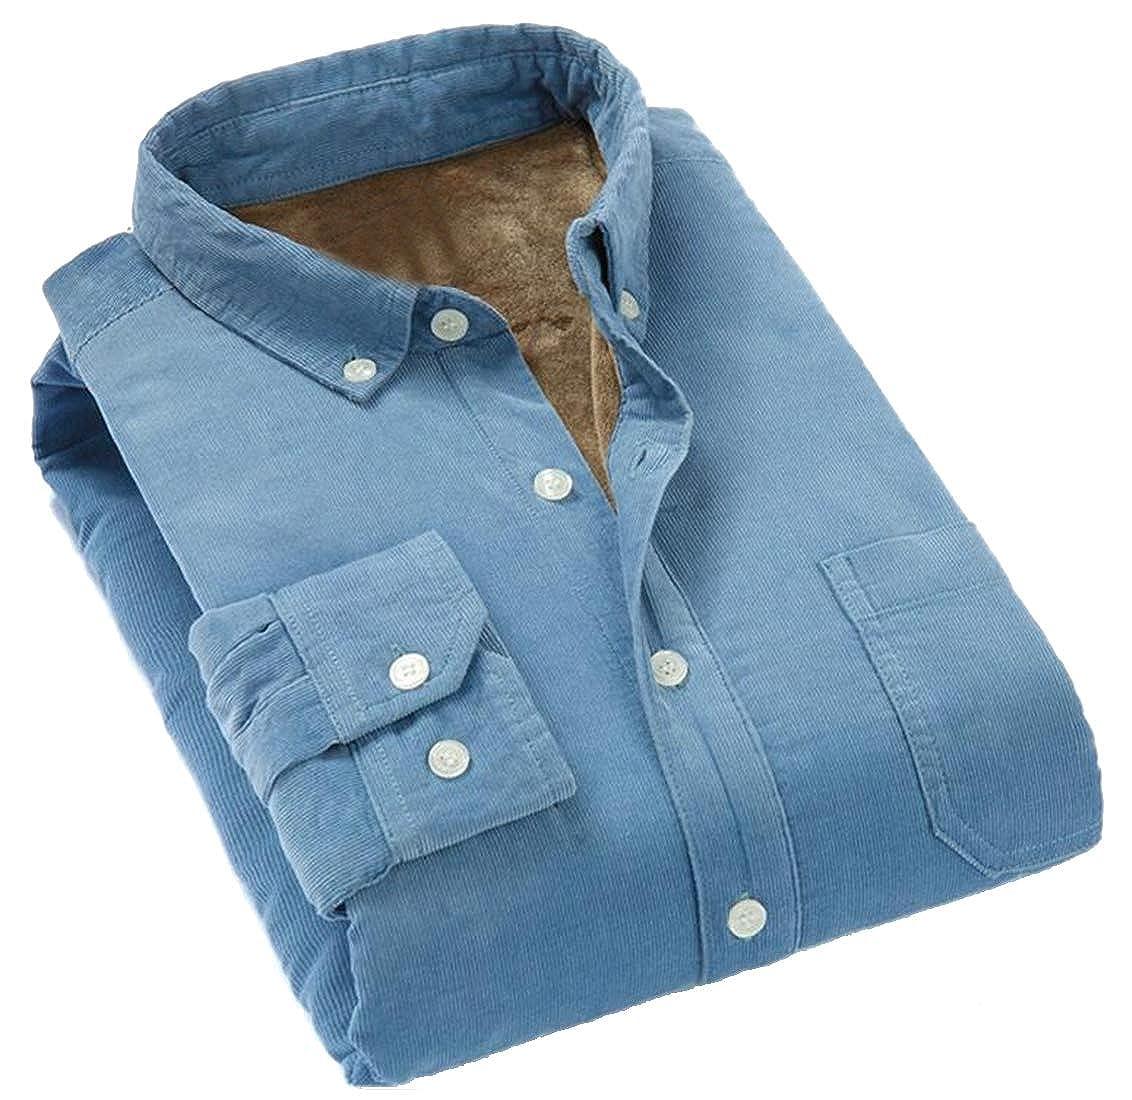 ARTFFEL Mens Fall /& Winter Button Up Warm Cotton Corduroy Fleece Casual Dress Shirts